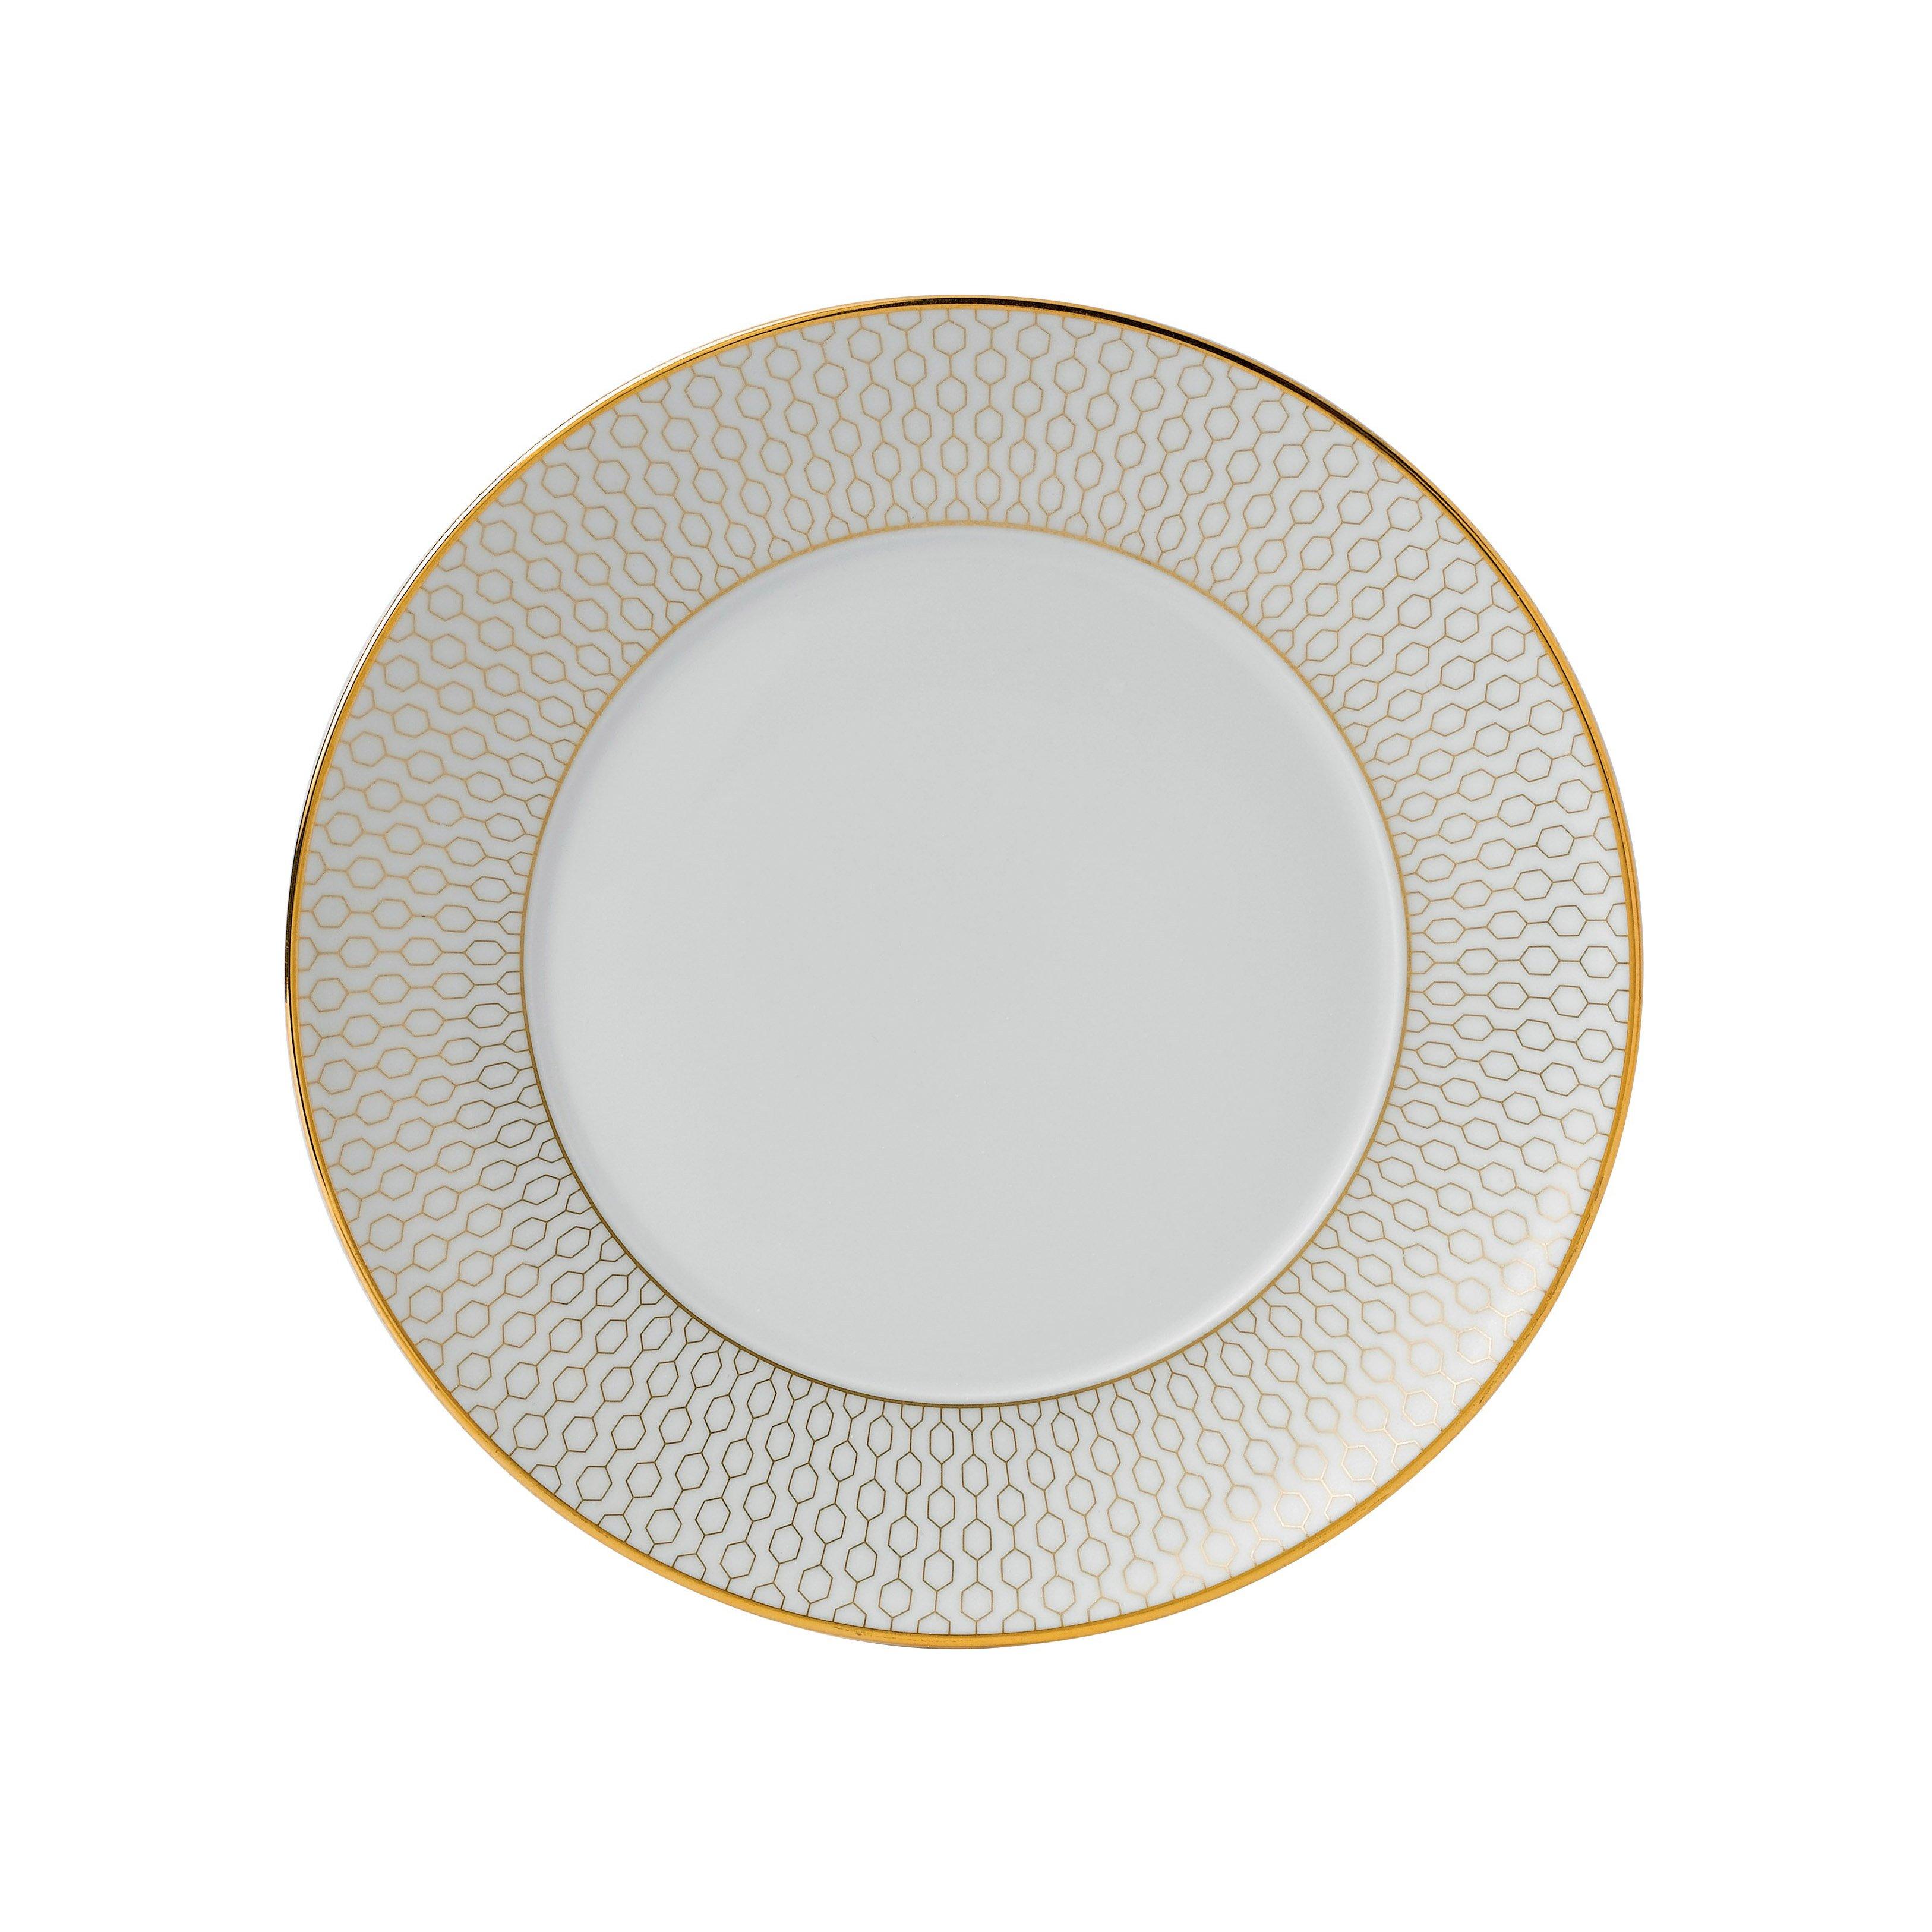 Arris Plate 17cm